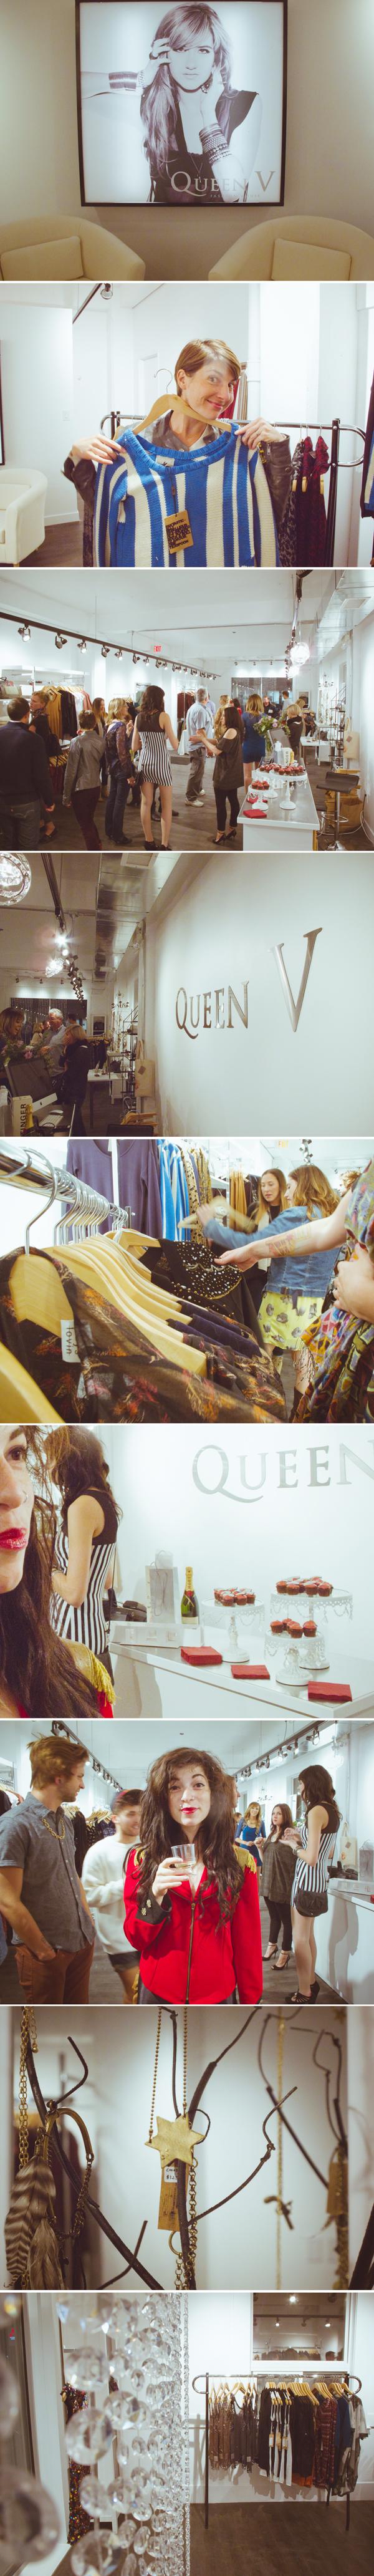 careyshaw_regina queeenv opening 2.jpg